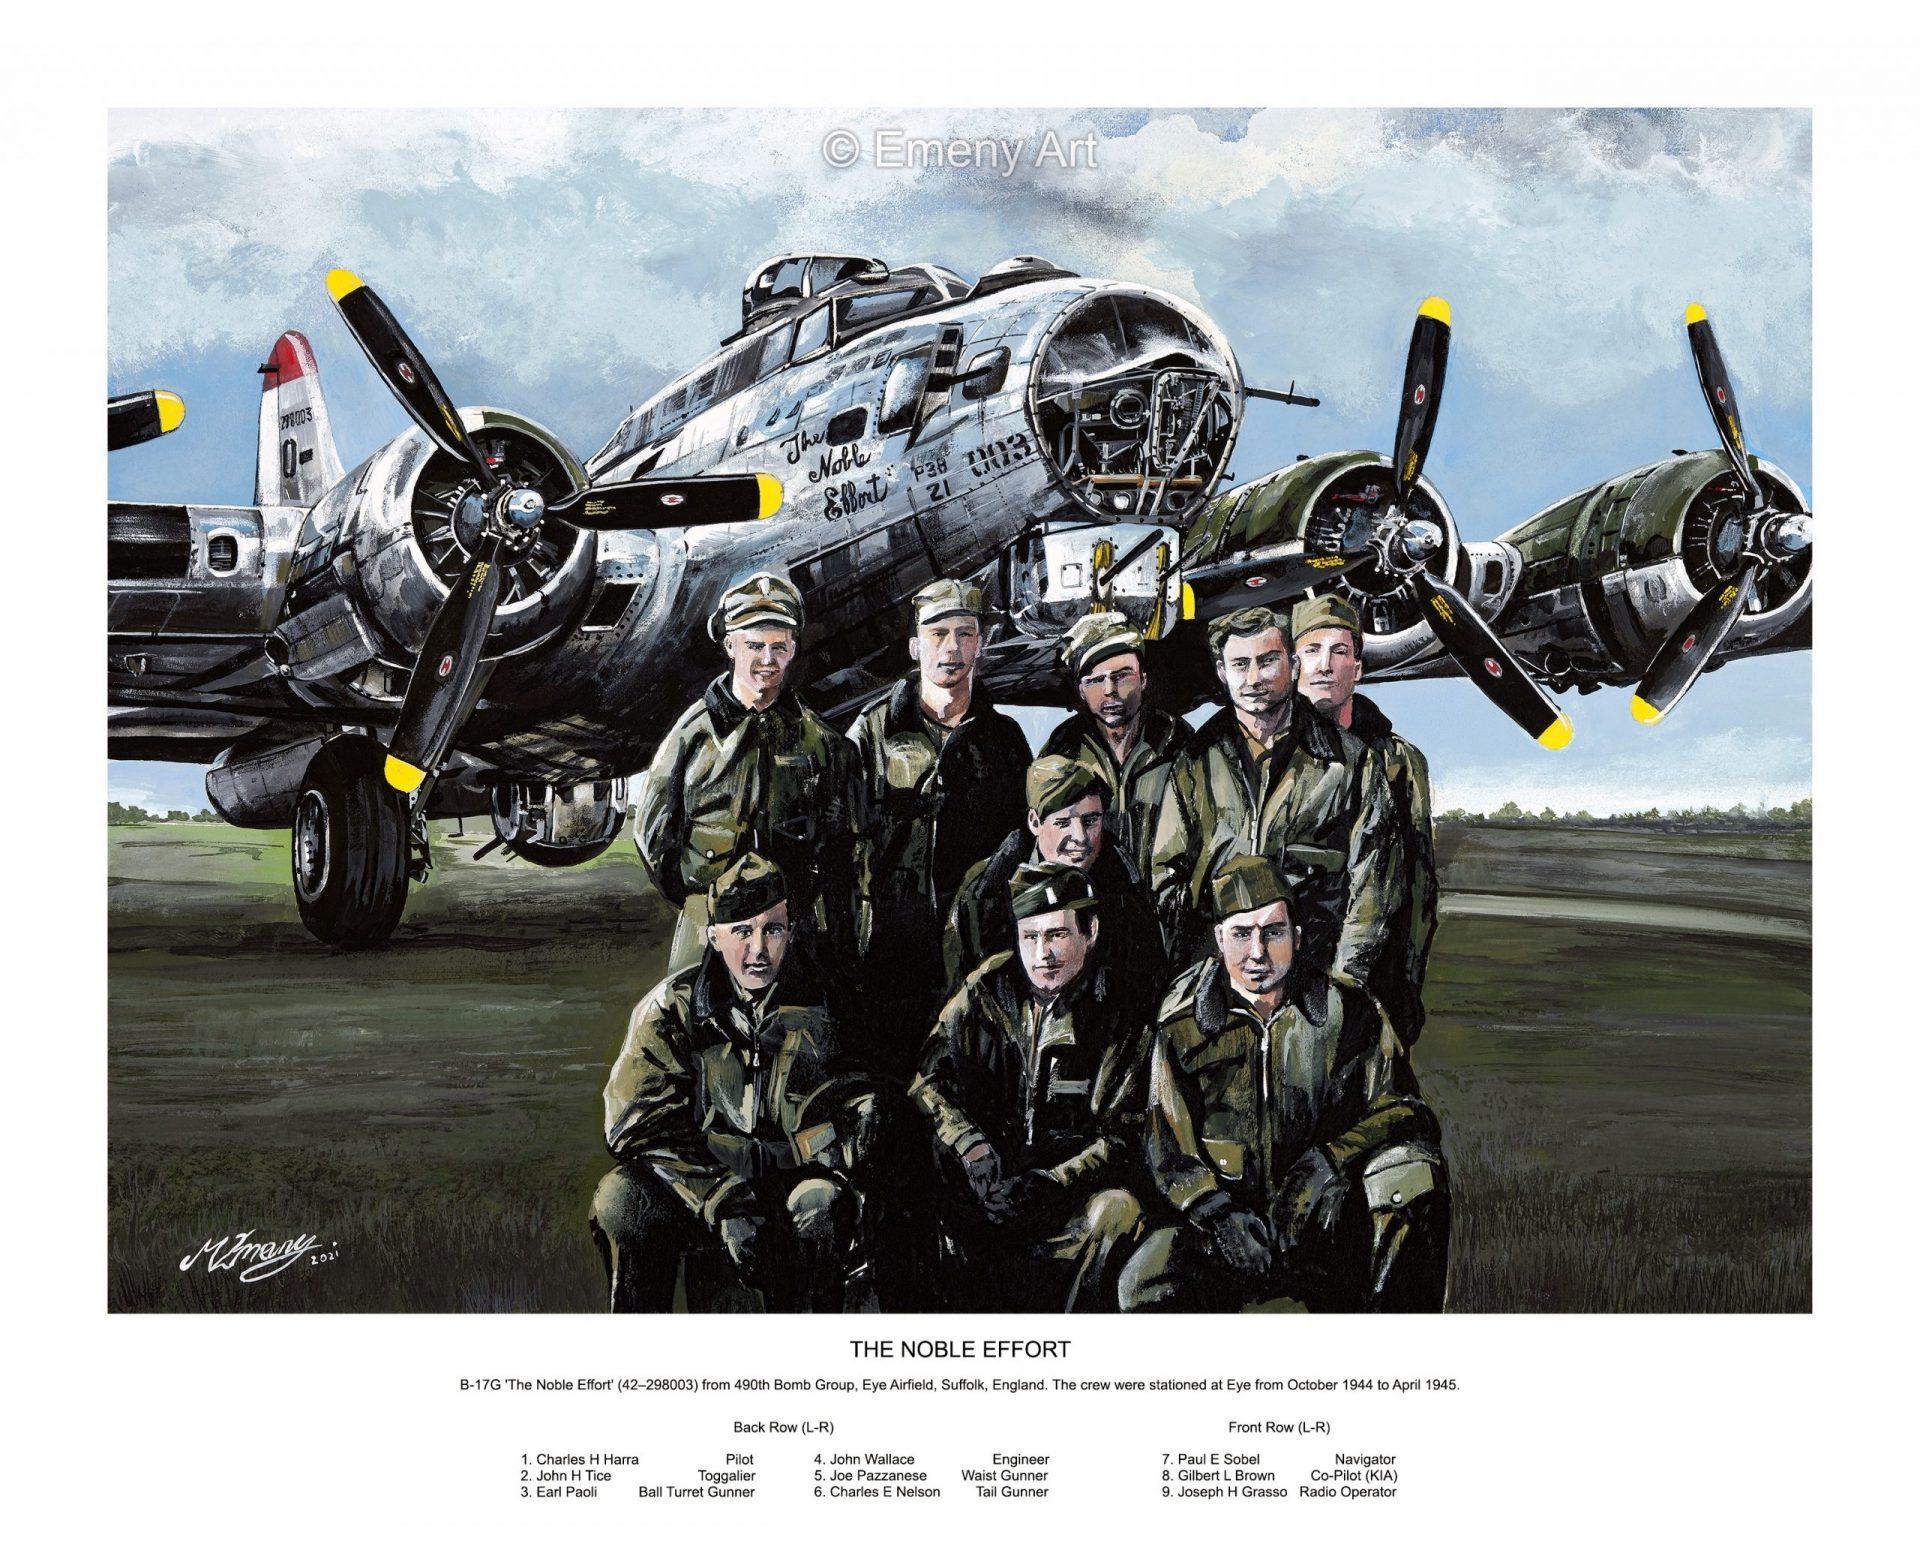 B-17G WWII Bomber.